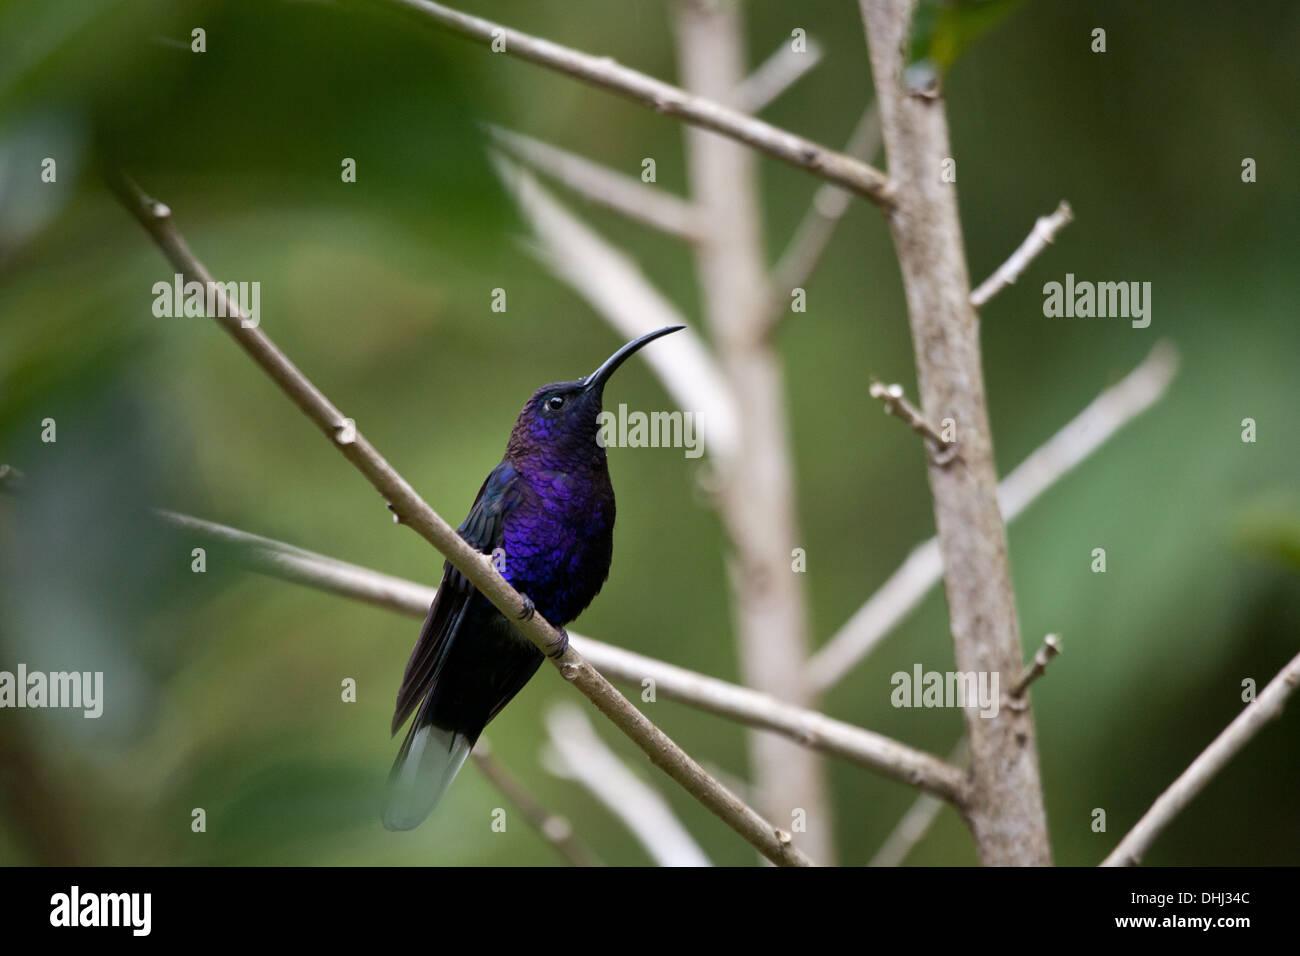 Violet Sabrewing hummingbird, Campylopterus hemileucurus, near Cerro Punta in Chiriqui province, Republic of Panama. Stock Photo